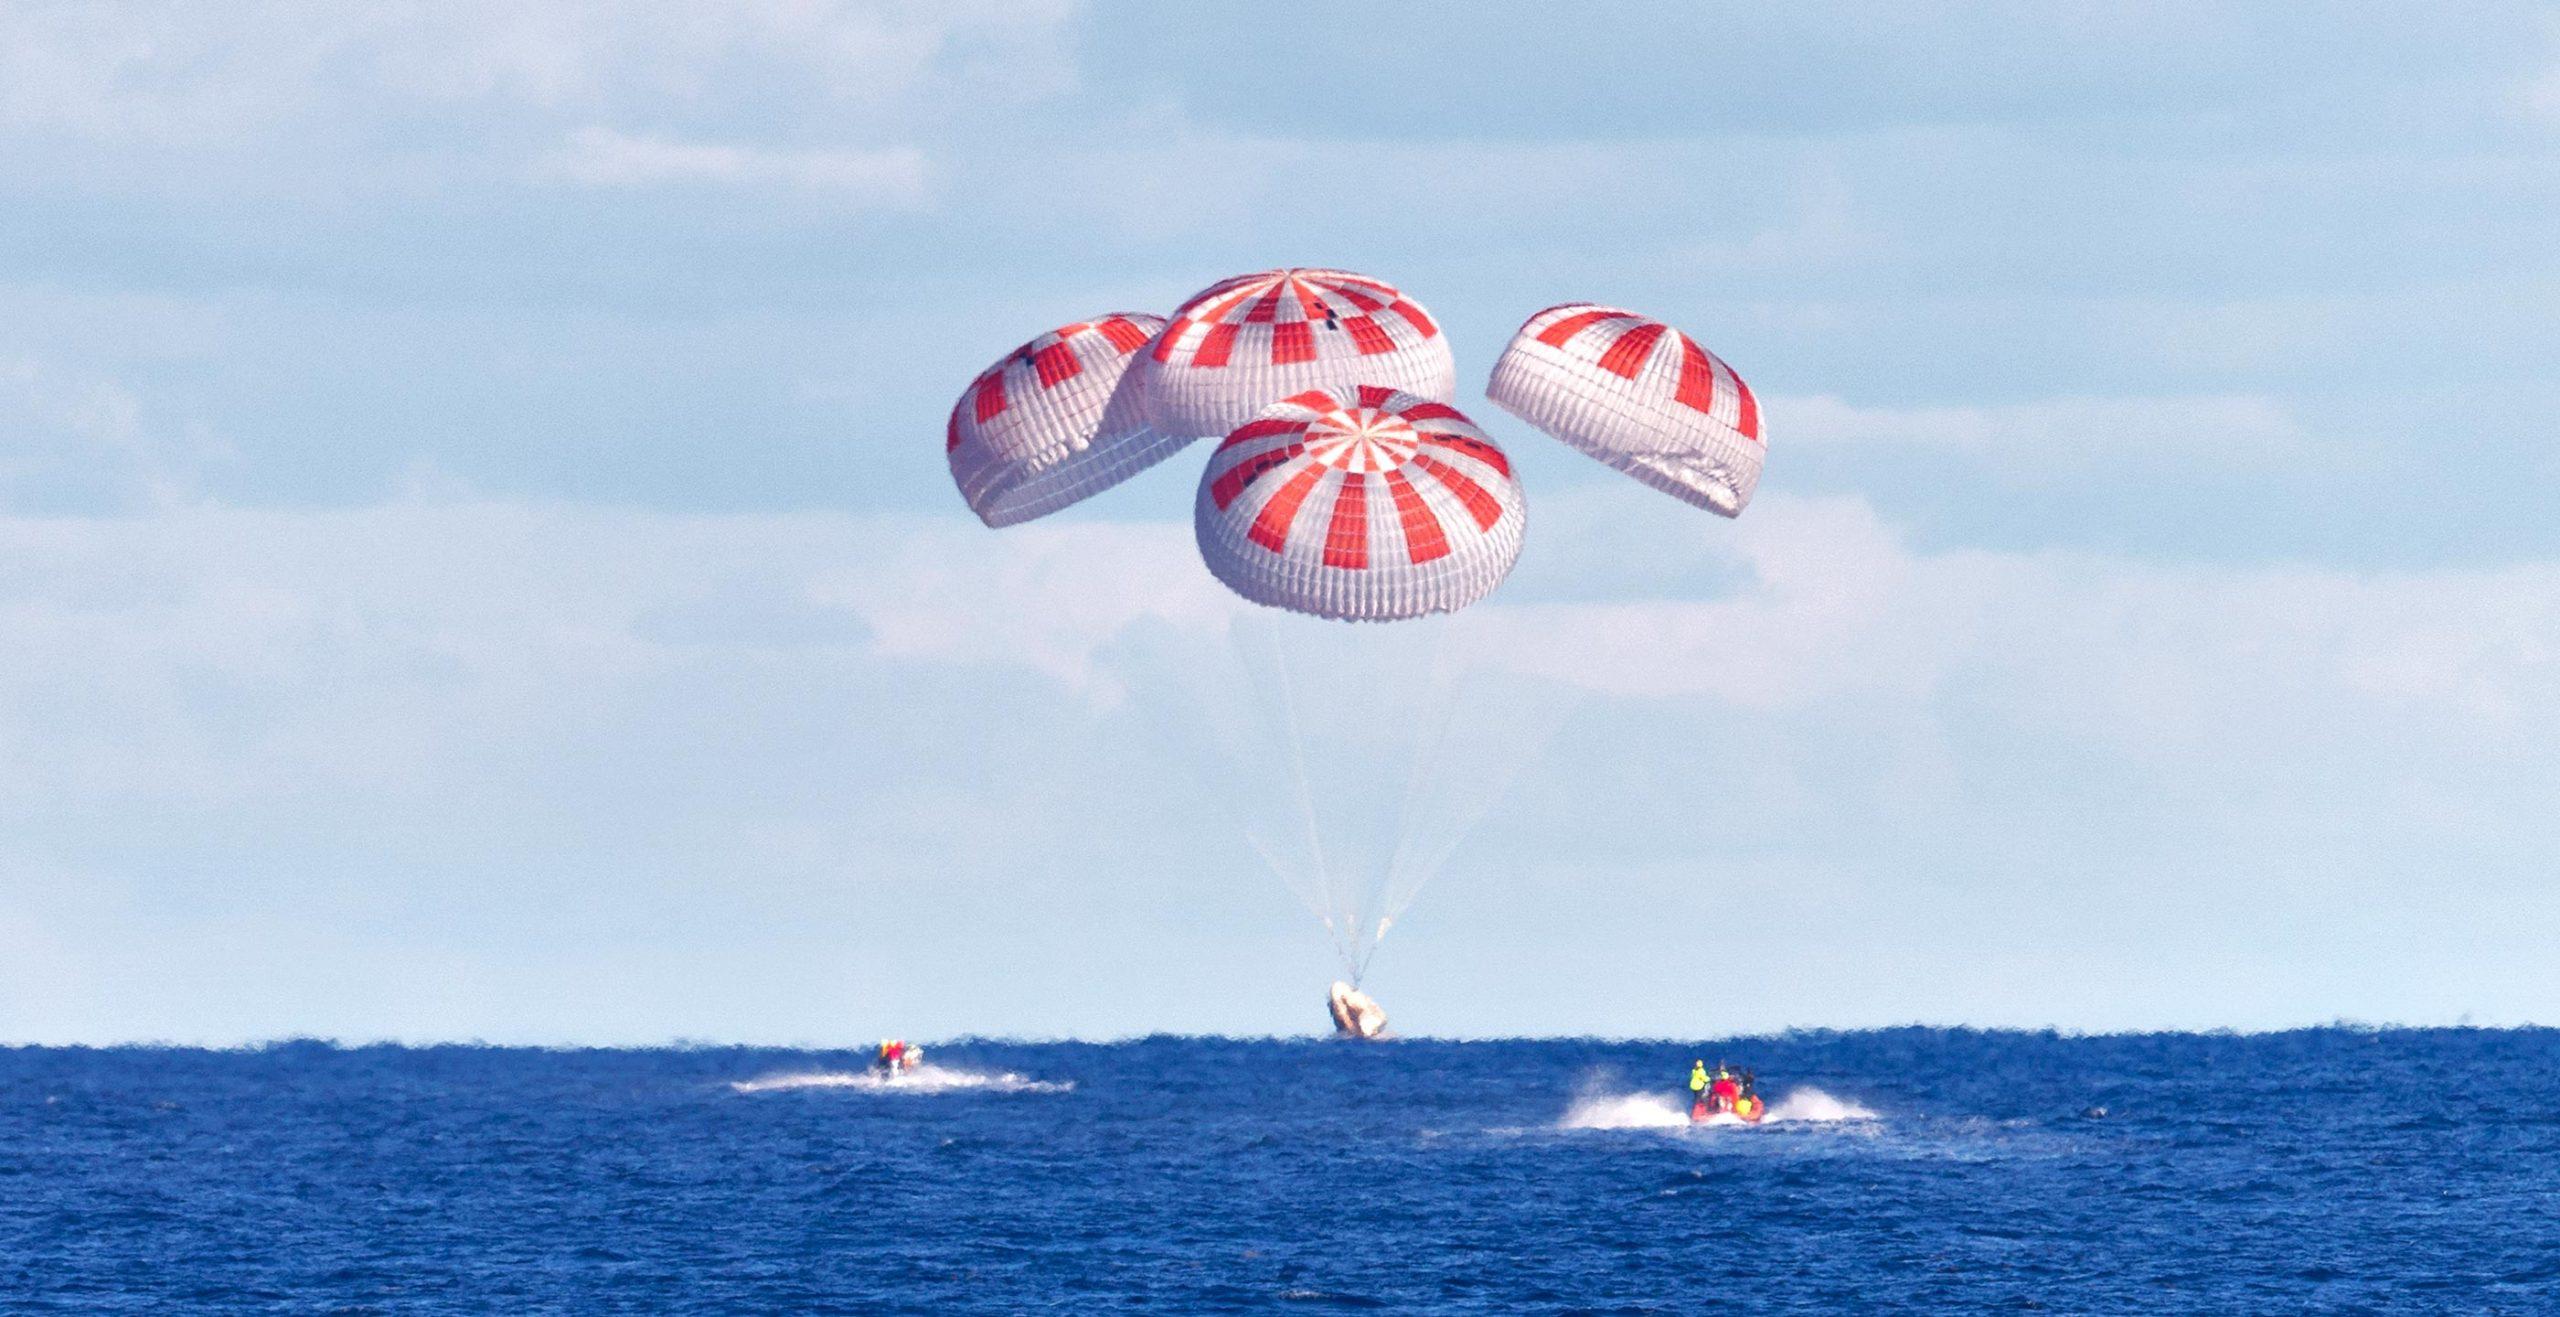 NASA Astronauts Wake Up, Prep SpaceX Crew Dragon For Splashdown